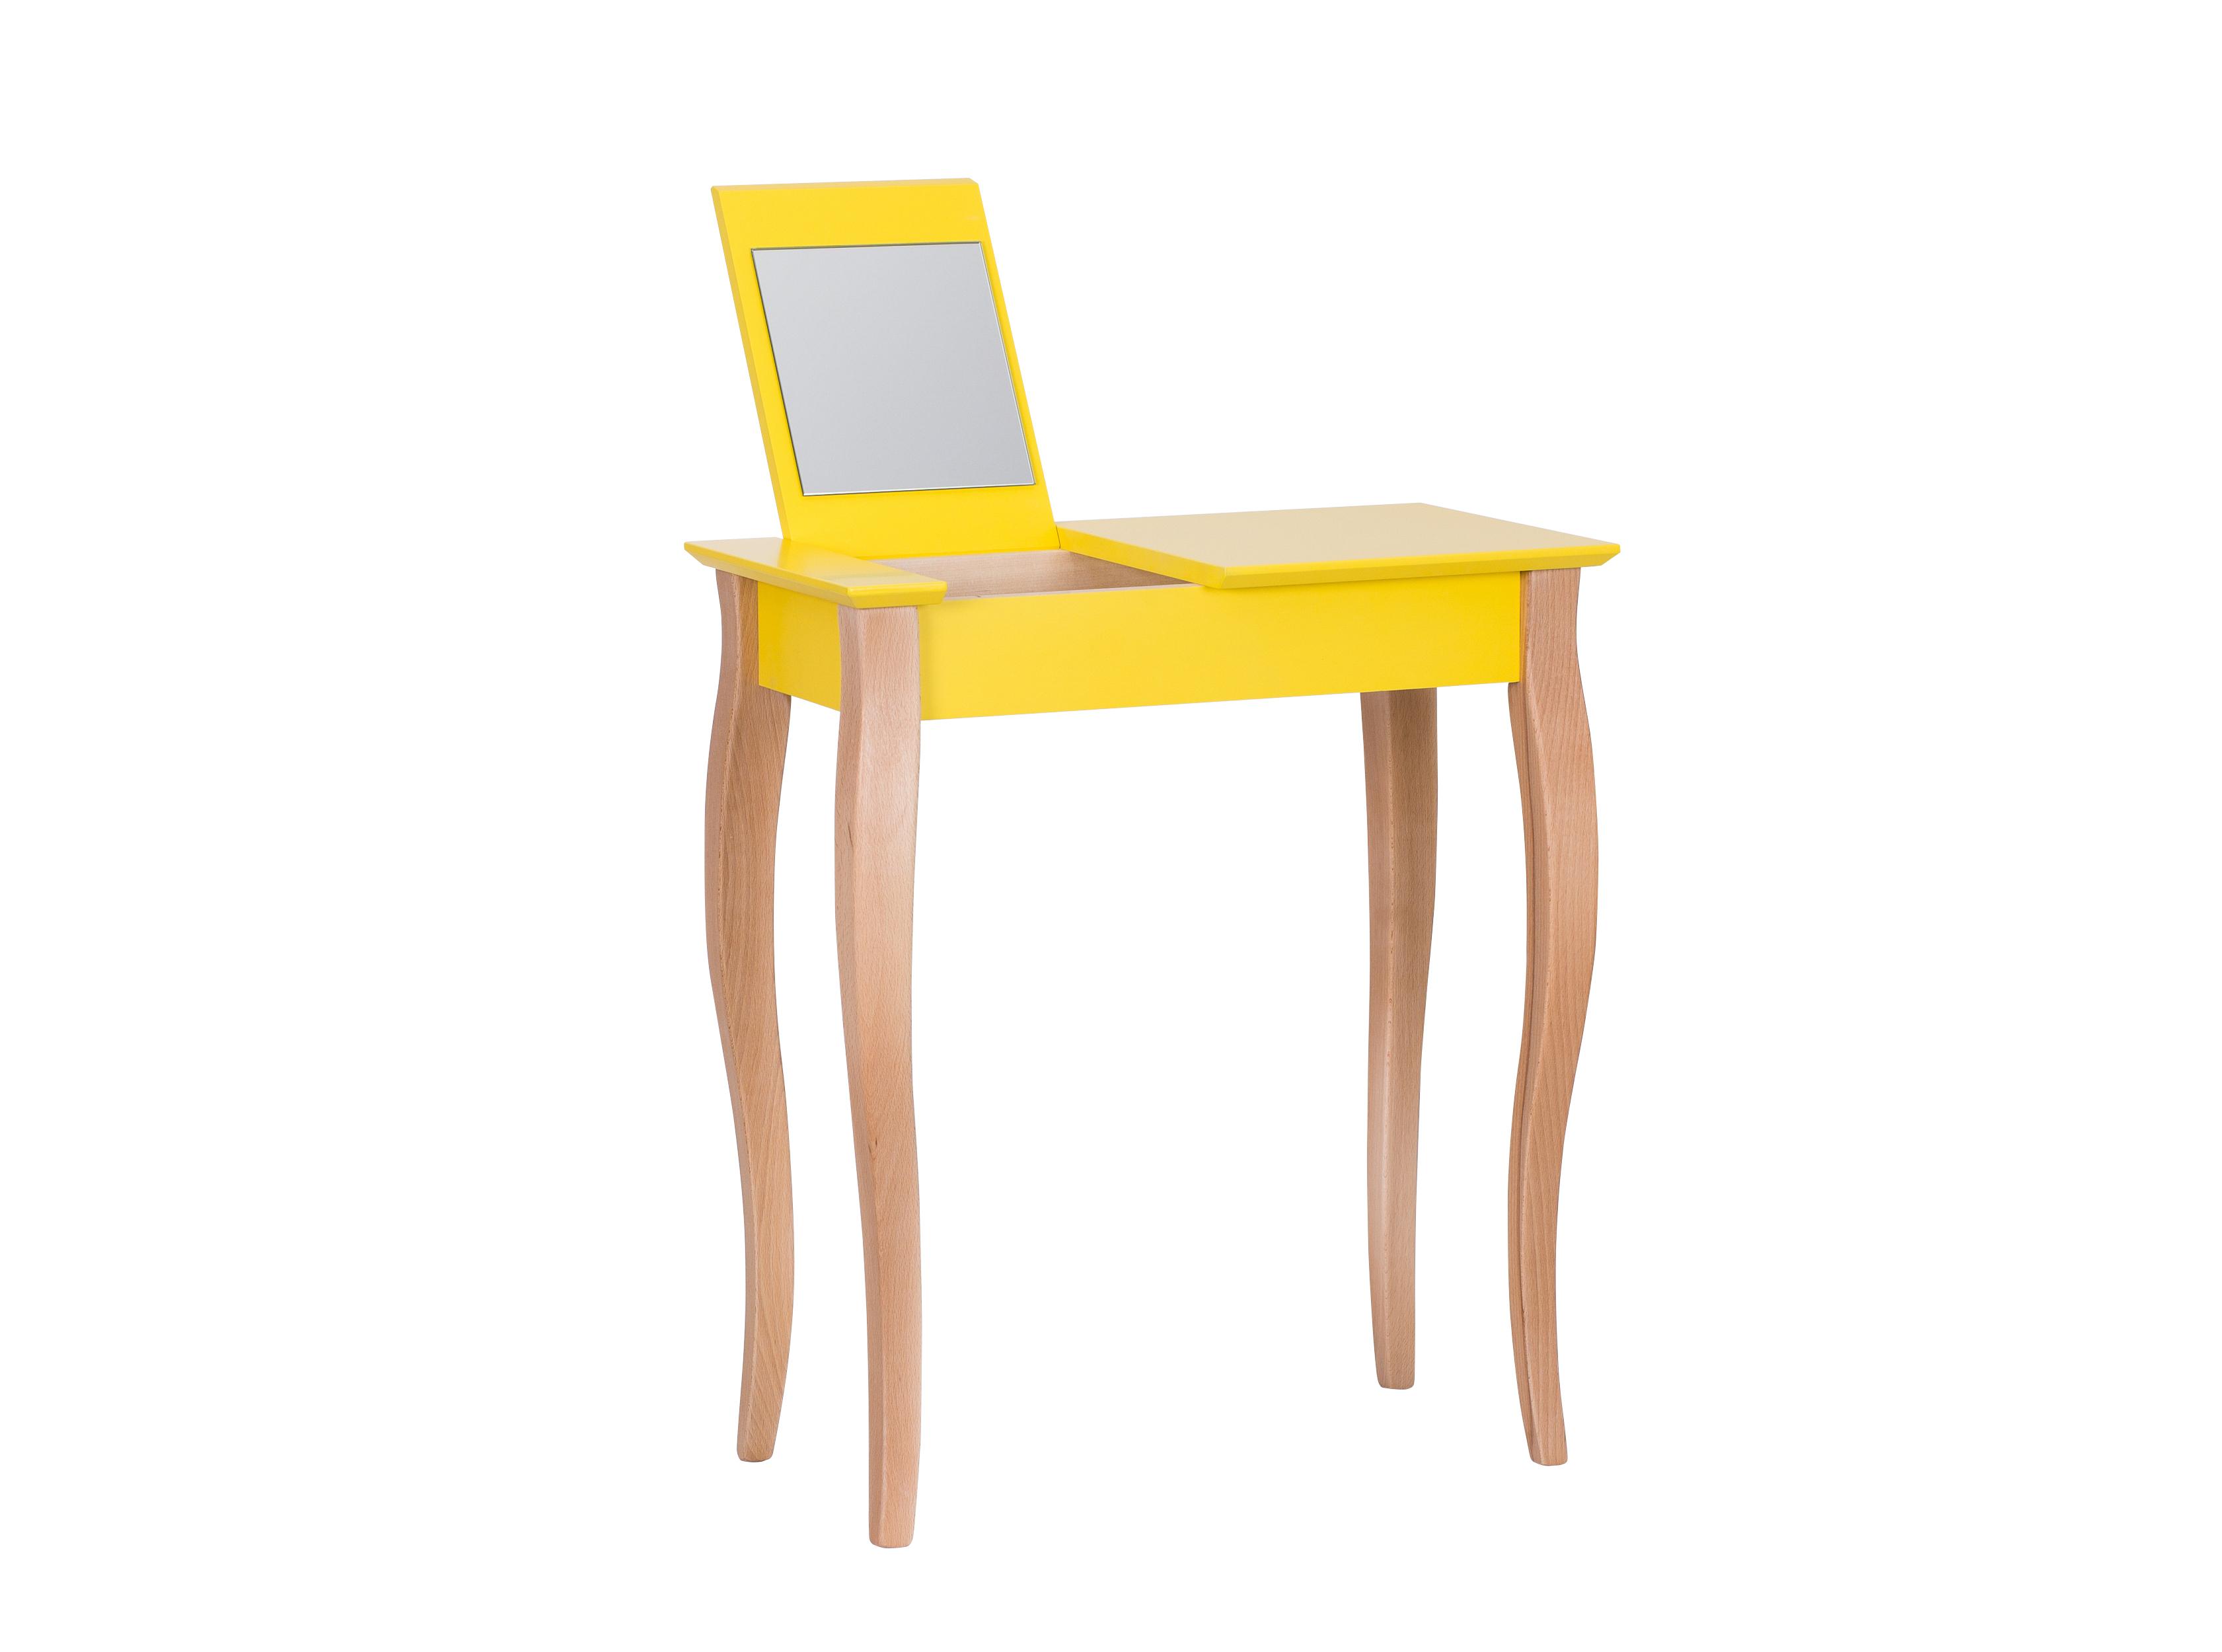 Masuta machiaj Lillo Small cu oglinda Yellow, L65xl35xh74 cm